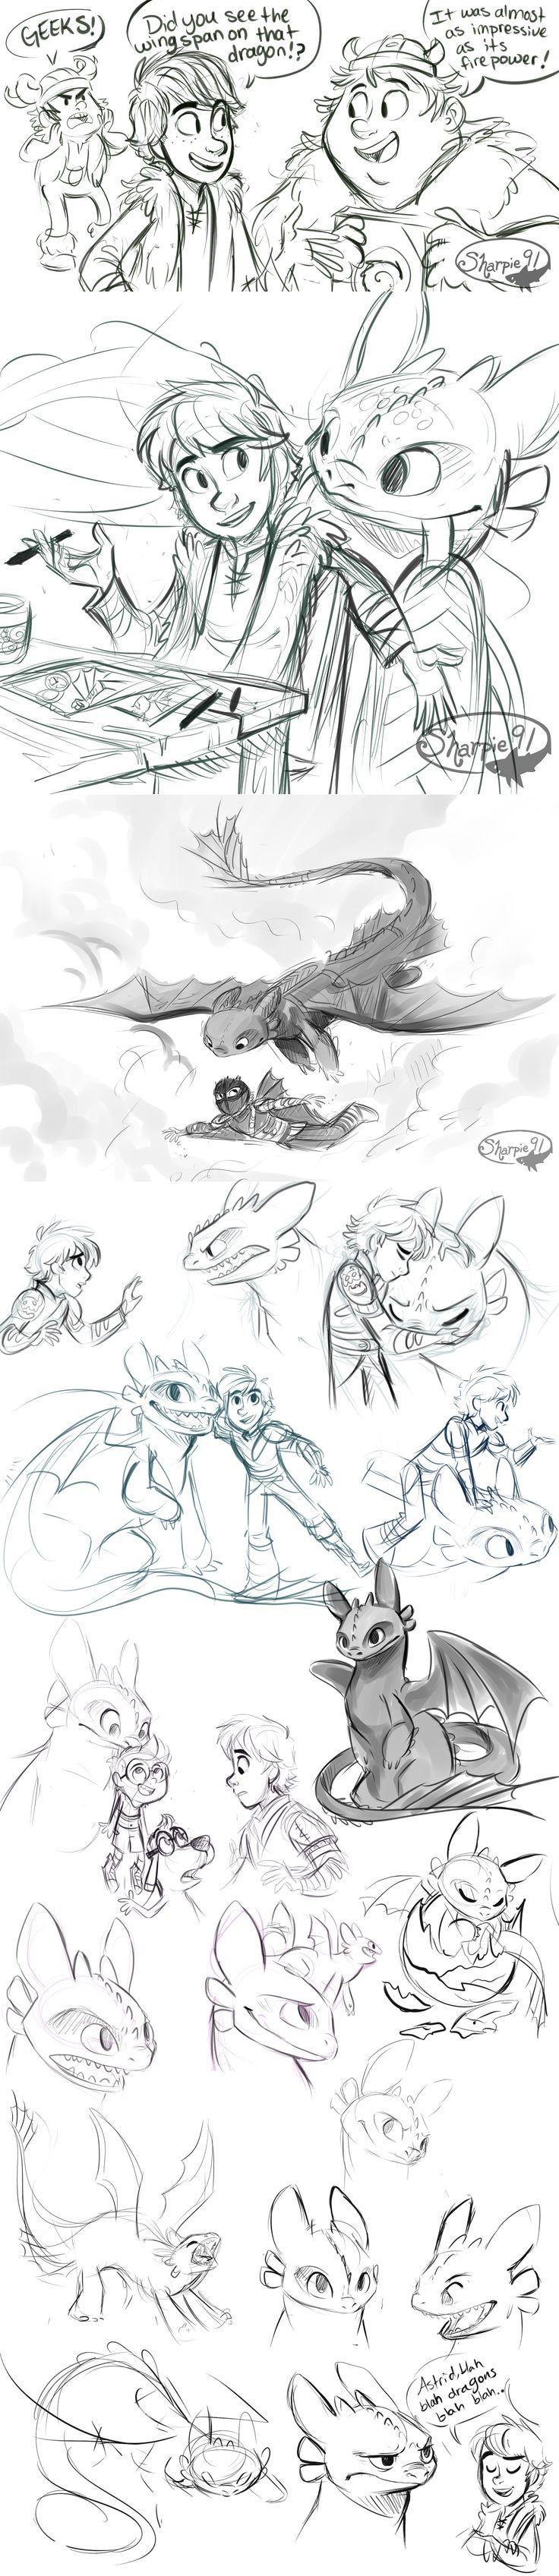 Httyd Stuff (spoilers) by sharpie91 on deviantART - How to Train Your Dragon Fanart